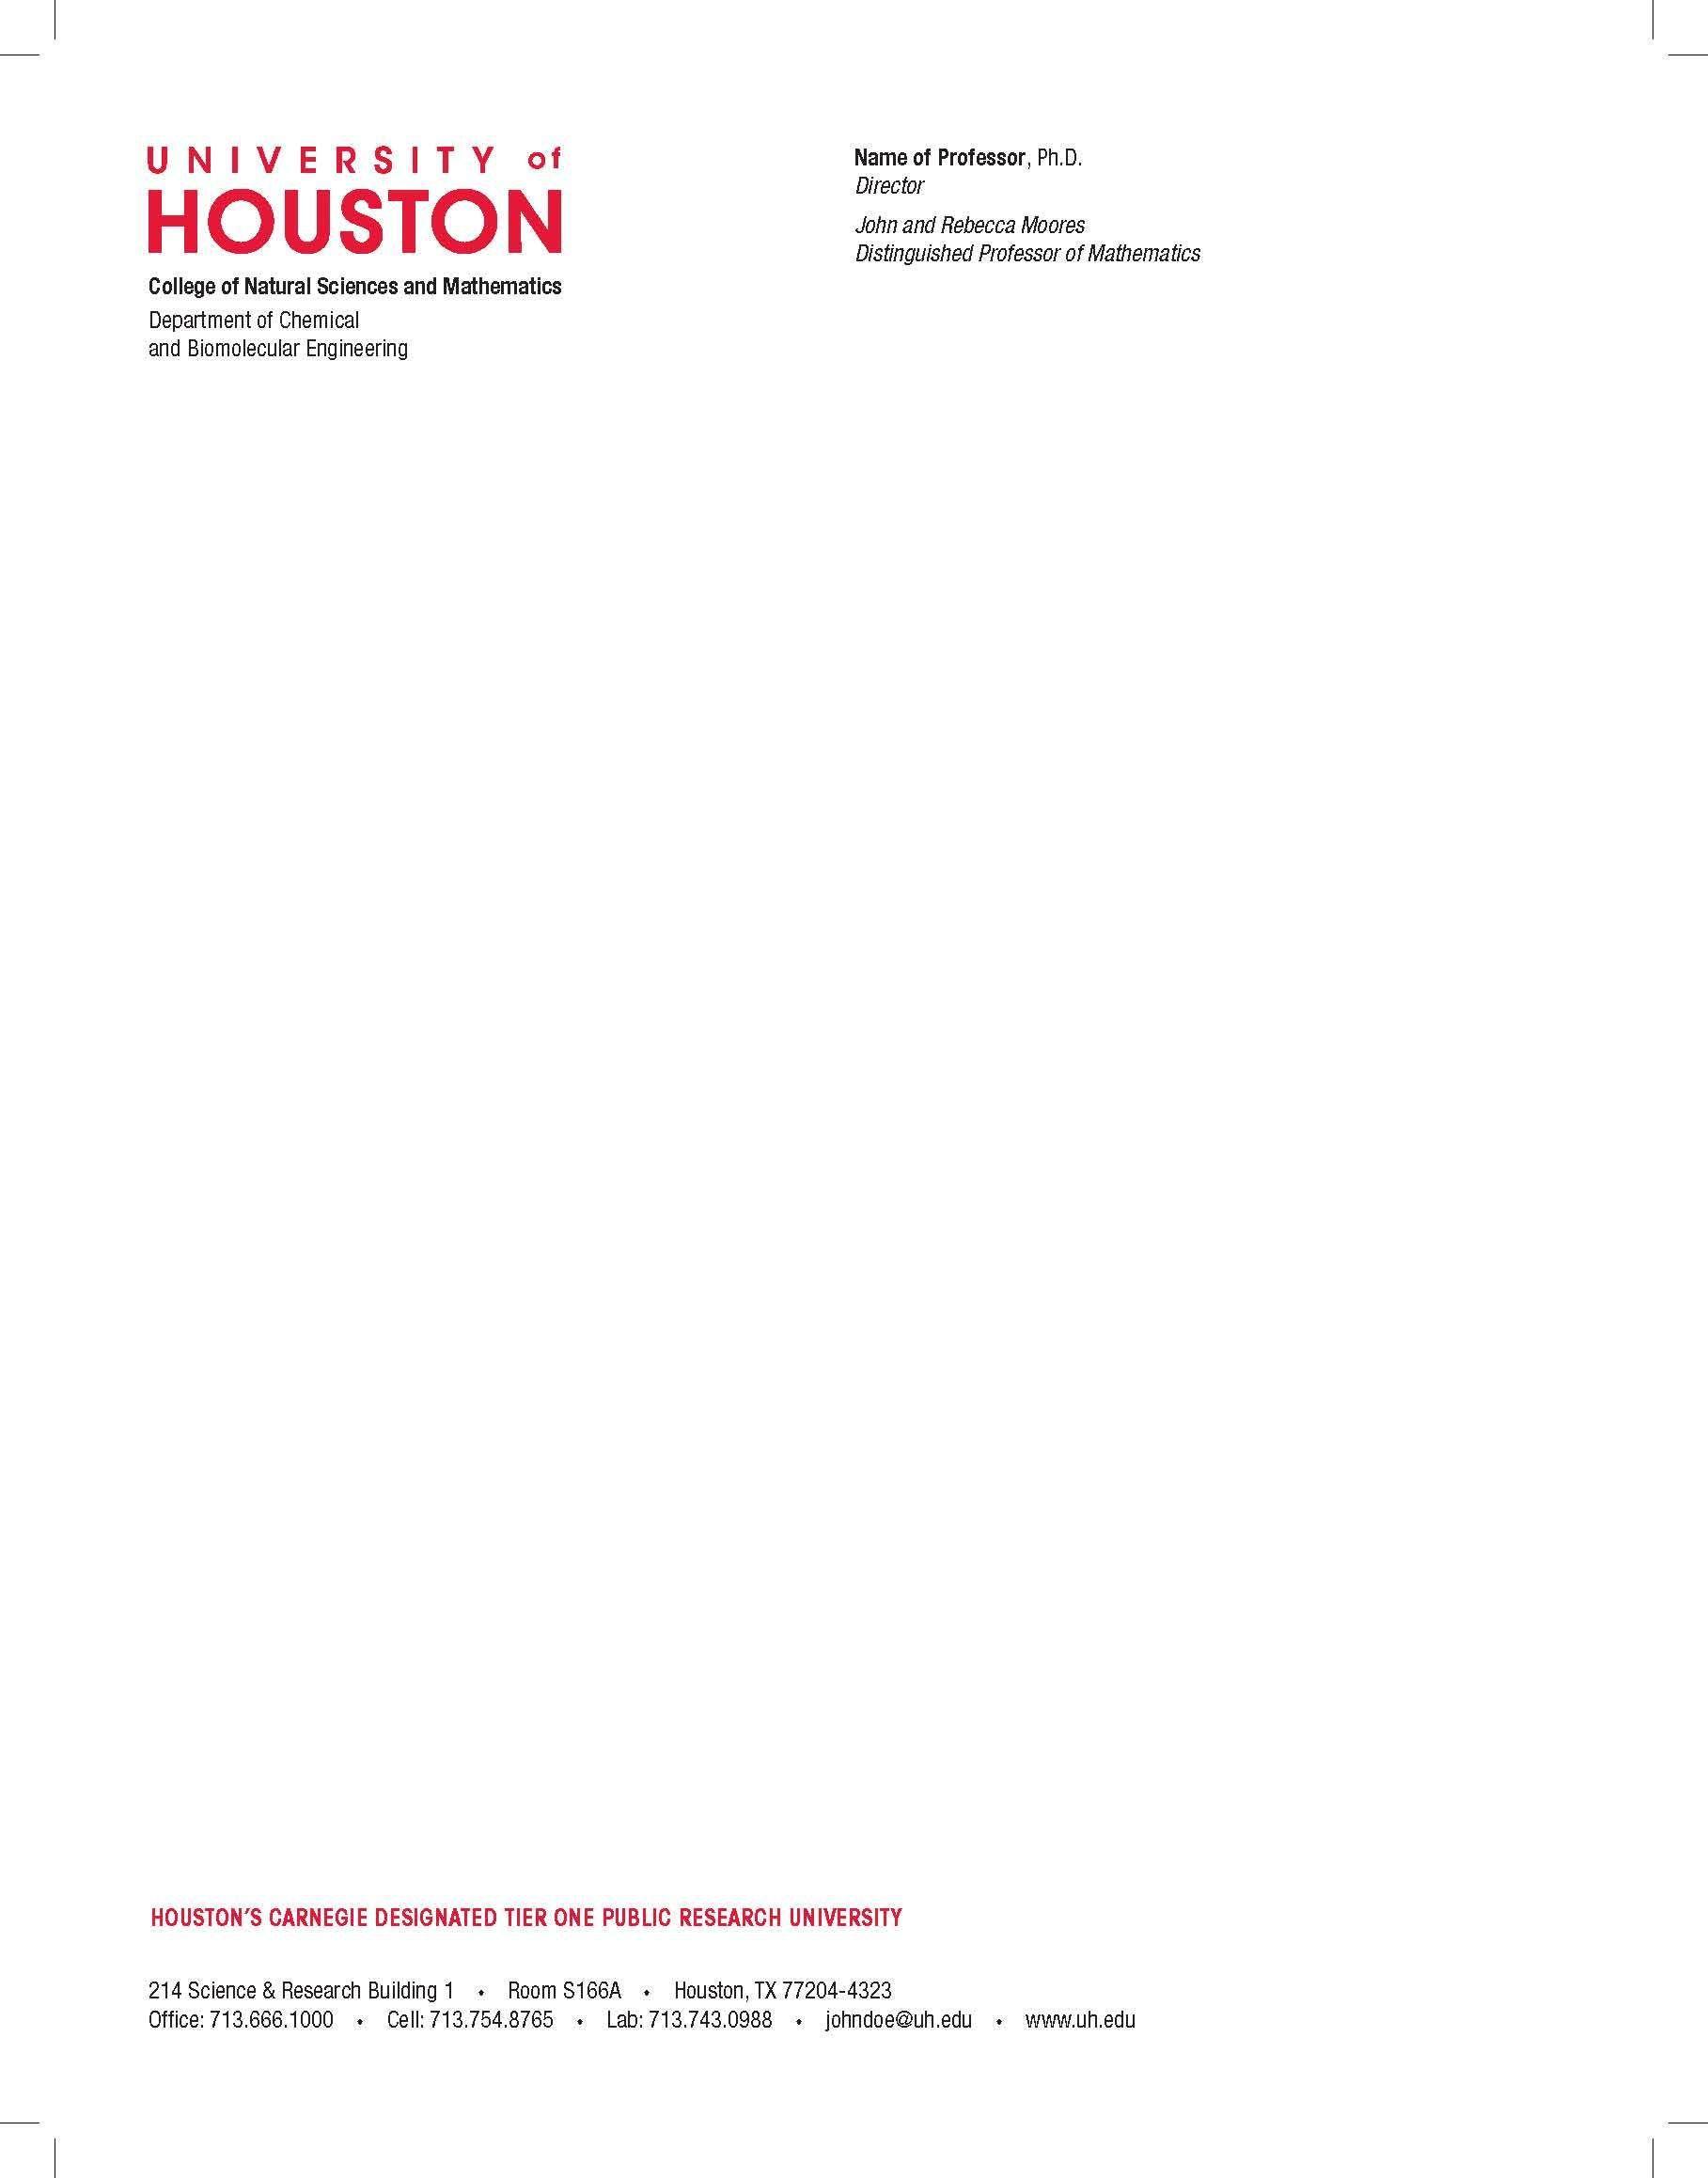 Free letterhead template 7941 letterheads pinterest free head example free sample business letter jpeg simple letterhead templates servey template best free home design idea inspiration altavistaventures Choice Image